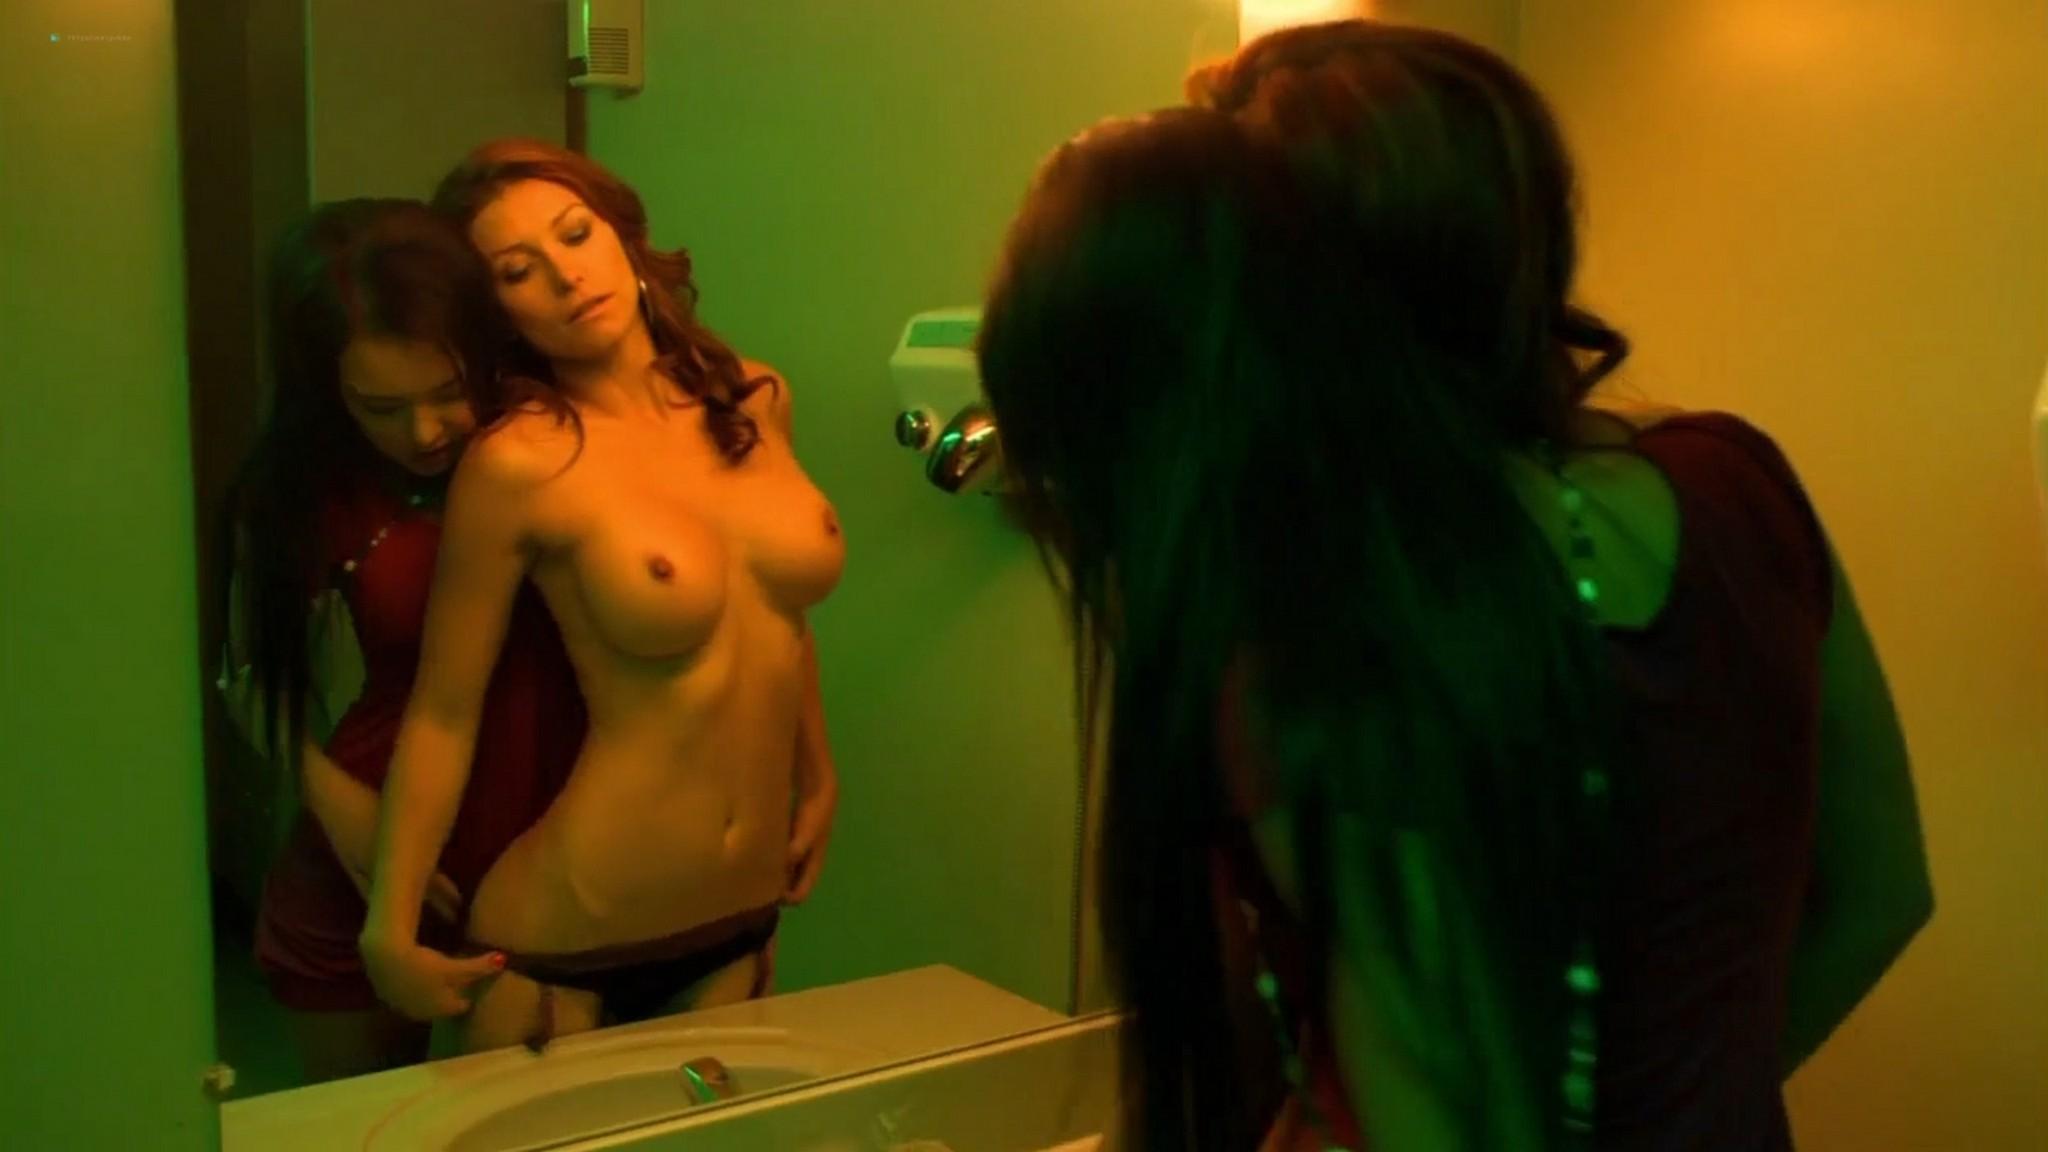 Lana Tailor nude lesbian sex Denise Cobar Erin Brown nude lot of sex Lingerie 2009 s1e11 HD 720p 010